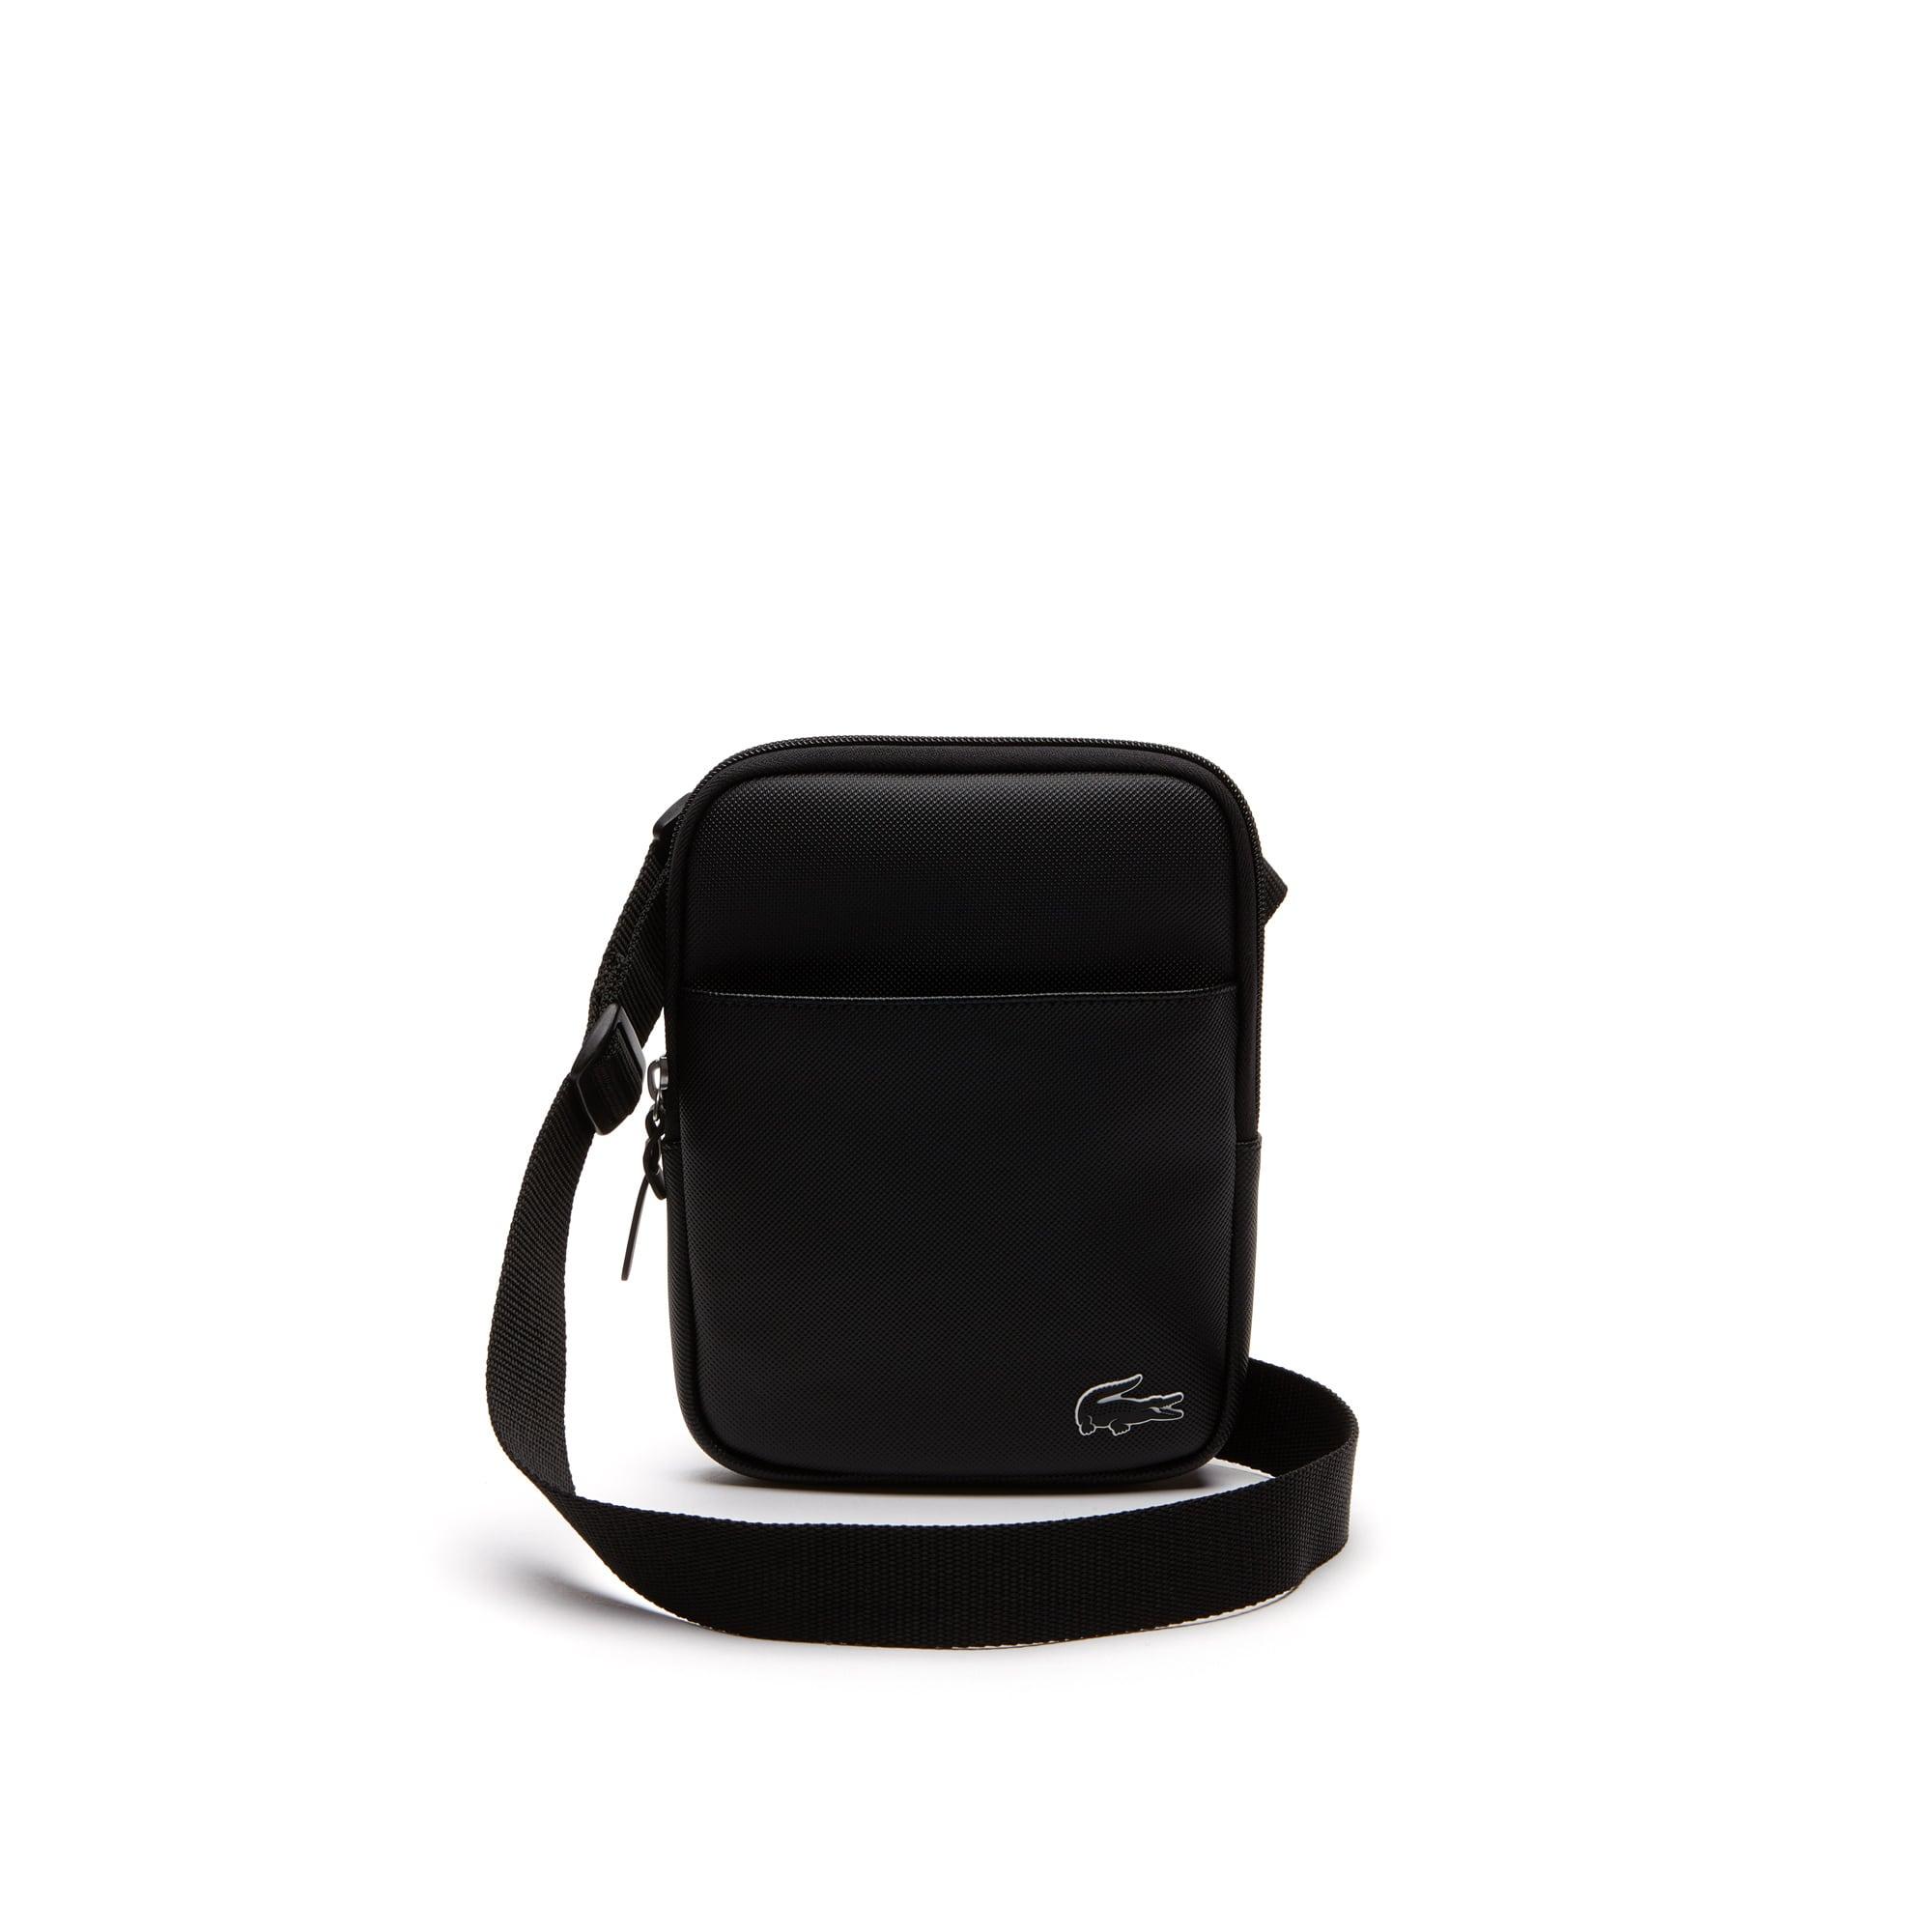 Men's L.12.12 Concept Petit Piqué Flat Crossover Bag